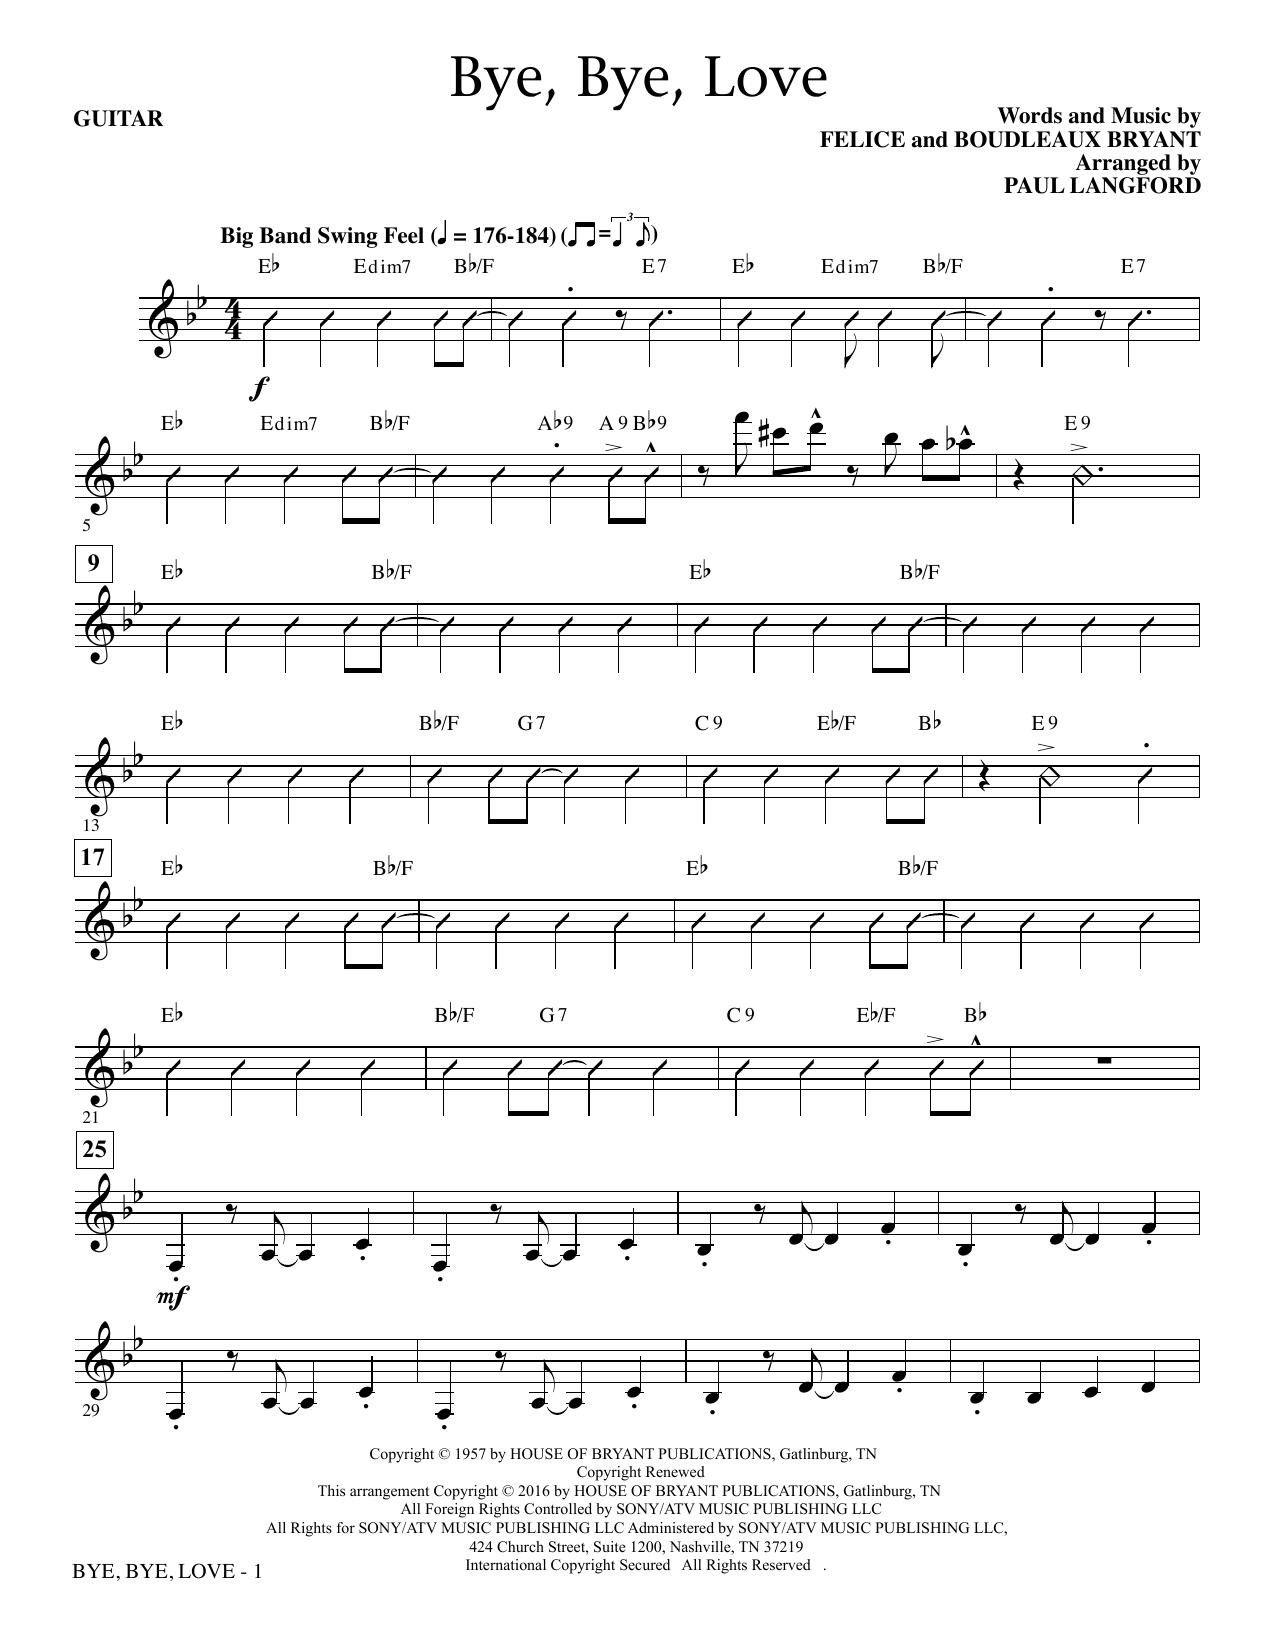 Bye, Bye Love - Guitar Sheet Music